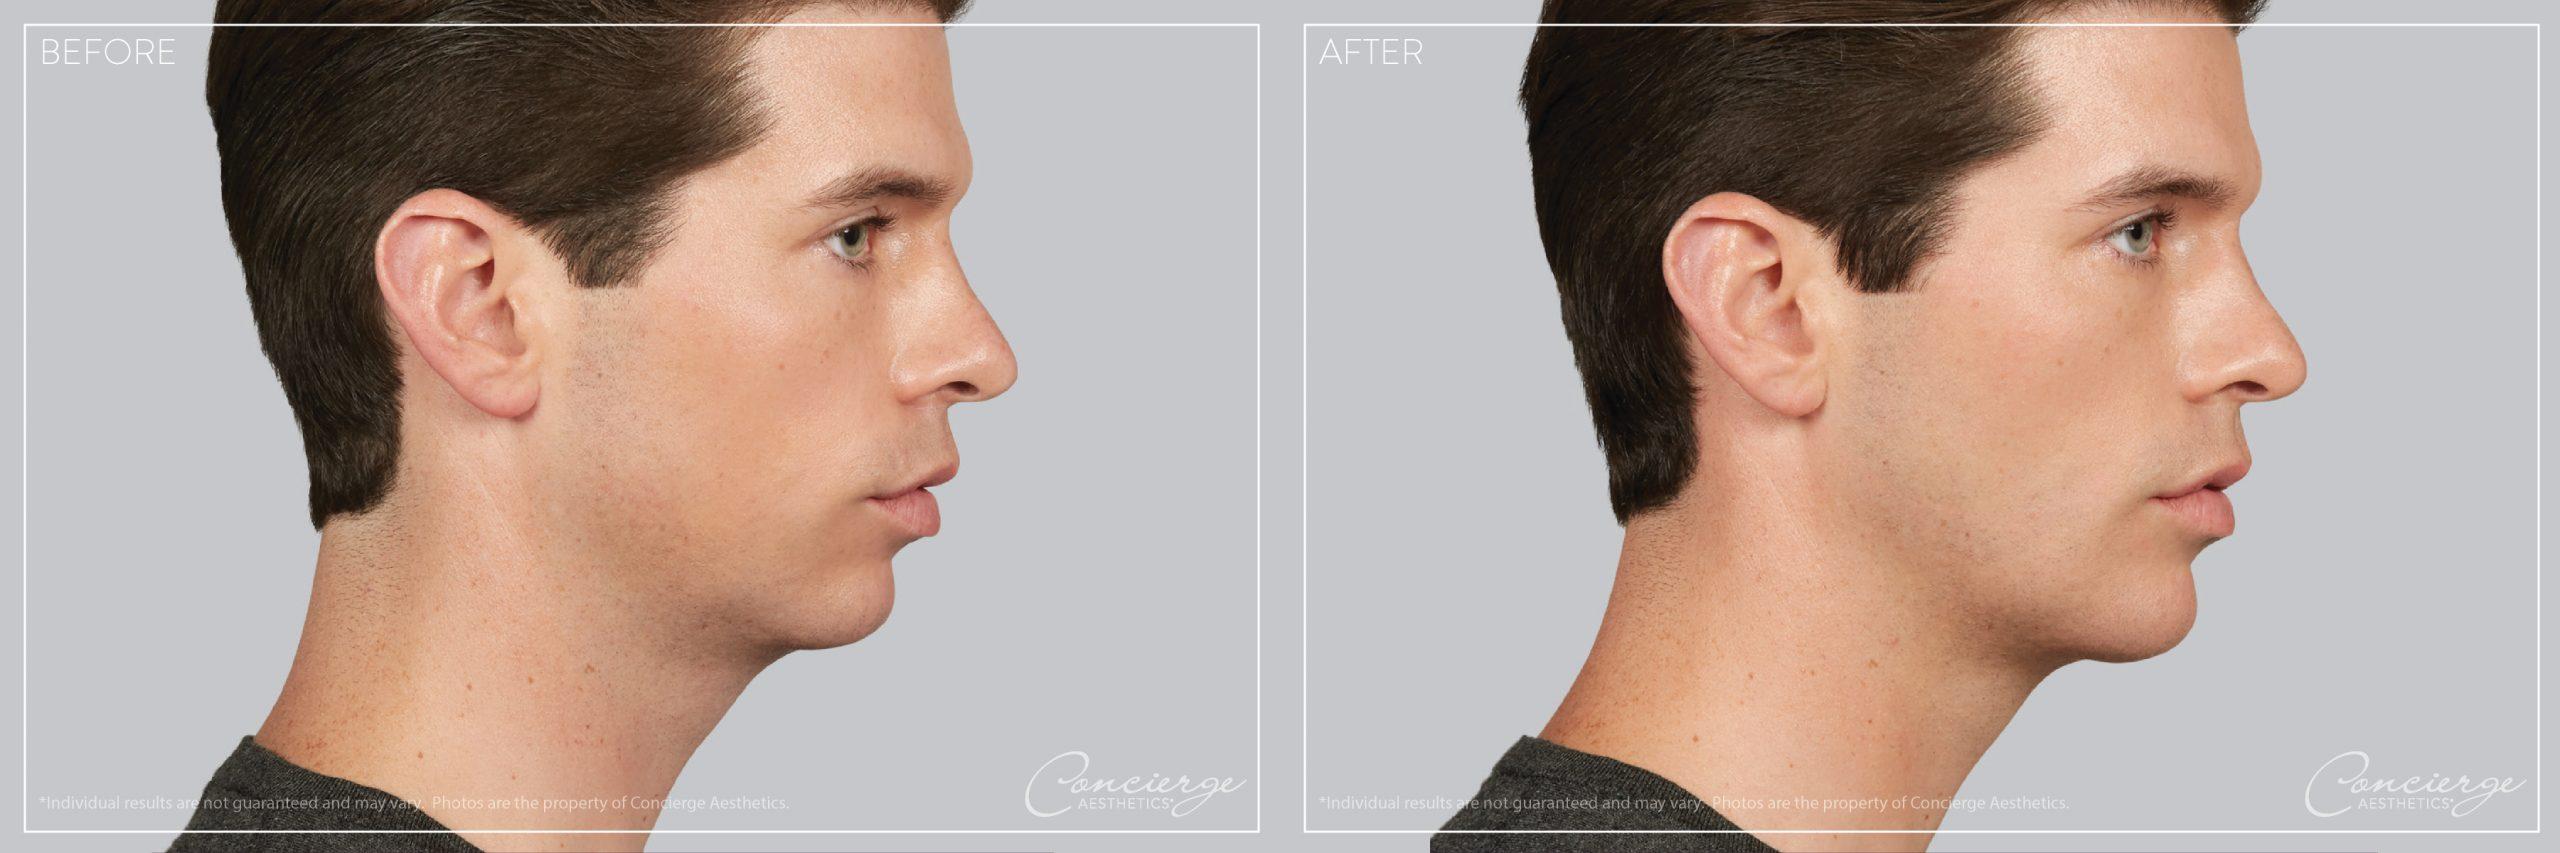 Before and After Photo - Juvederm Voluma - Chin - Concierge Aesthetics - Irvine (Orange County)